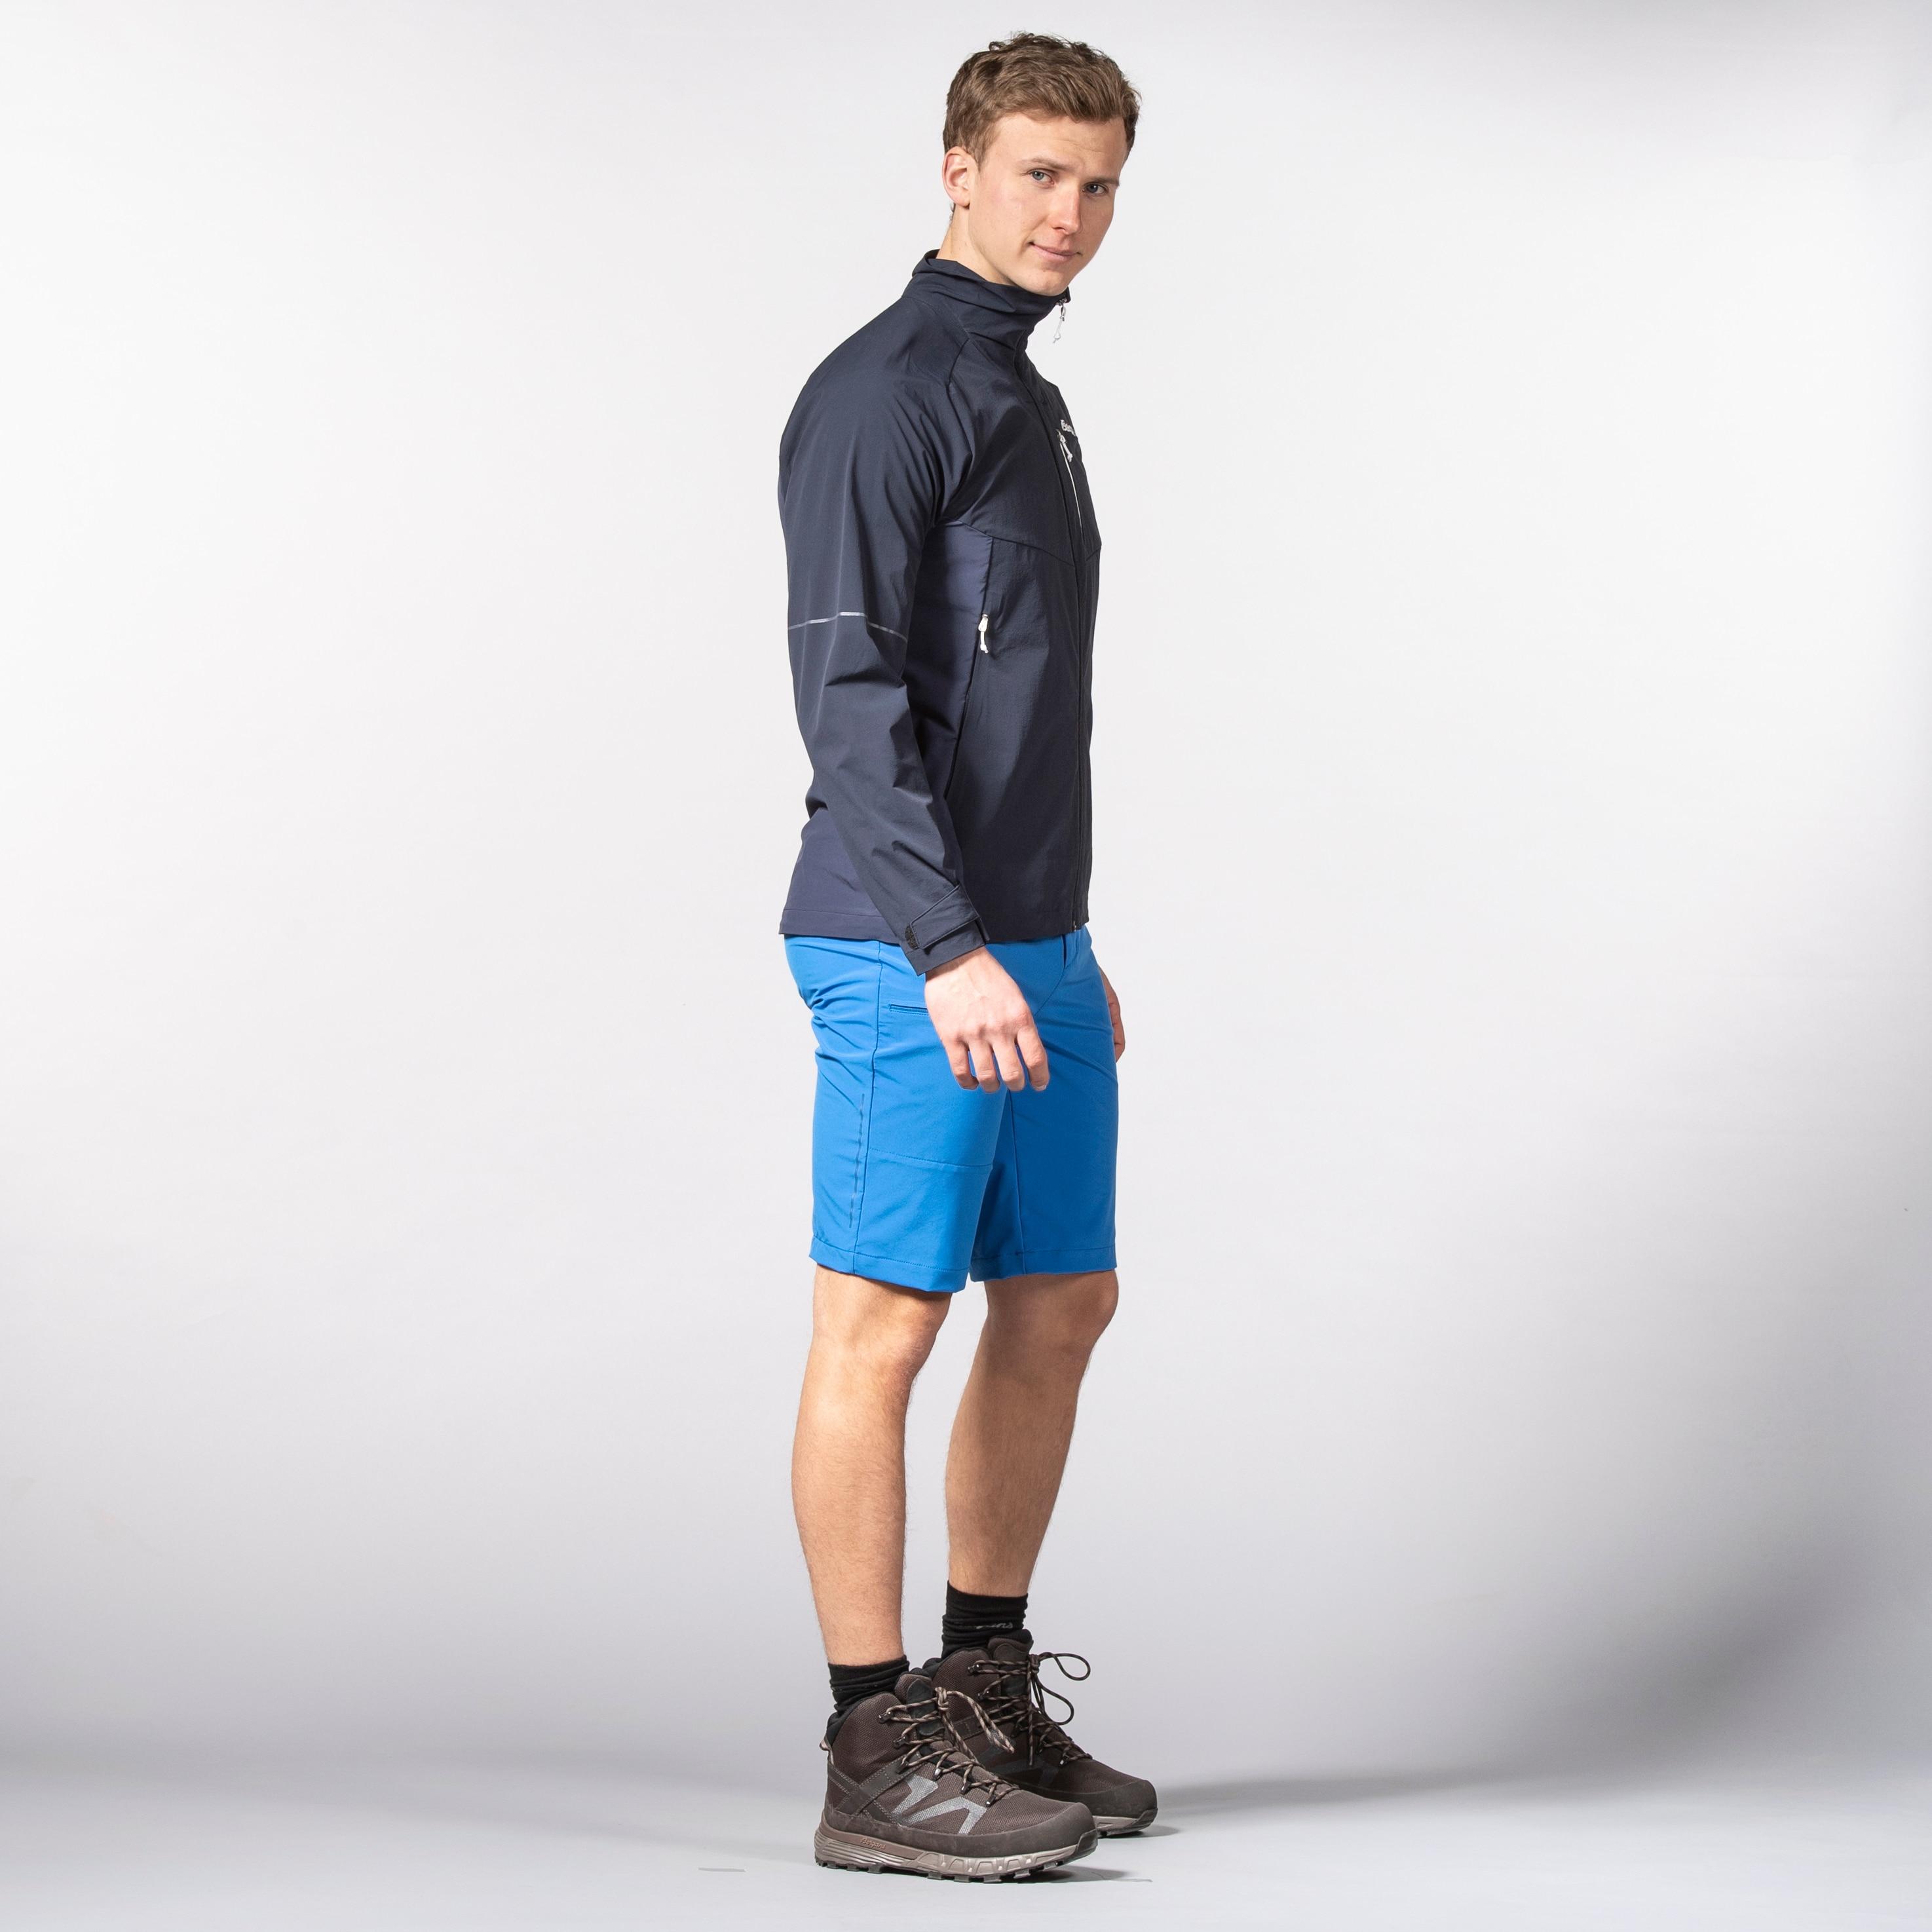 Slingsby LT Softshell Jacket